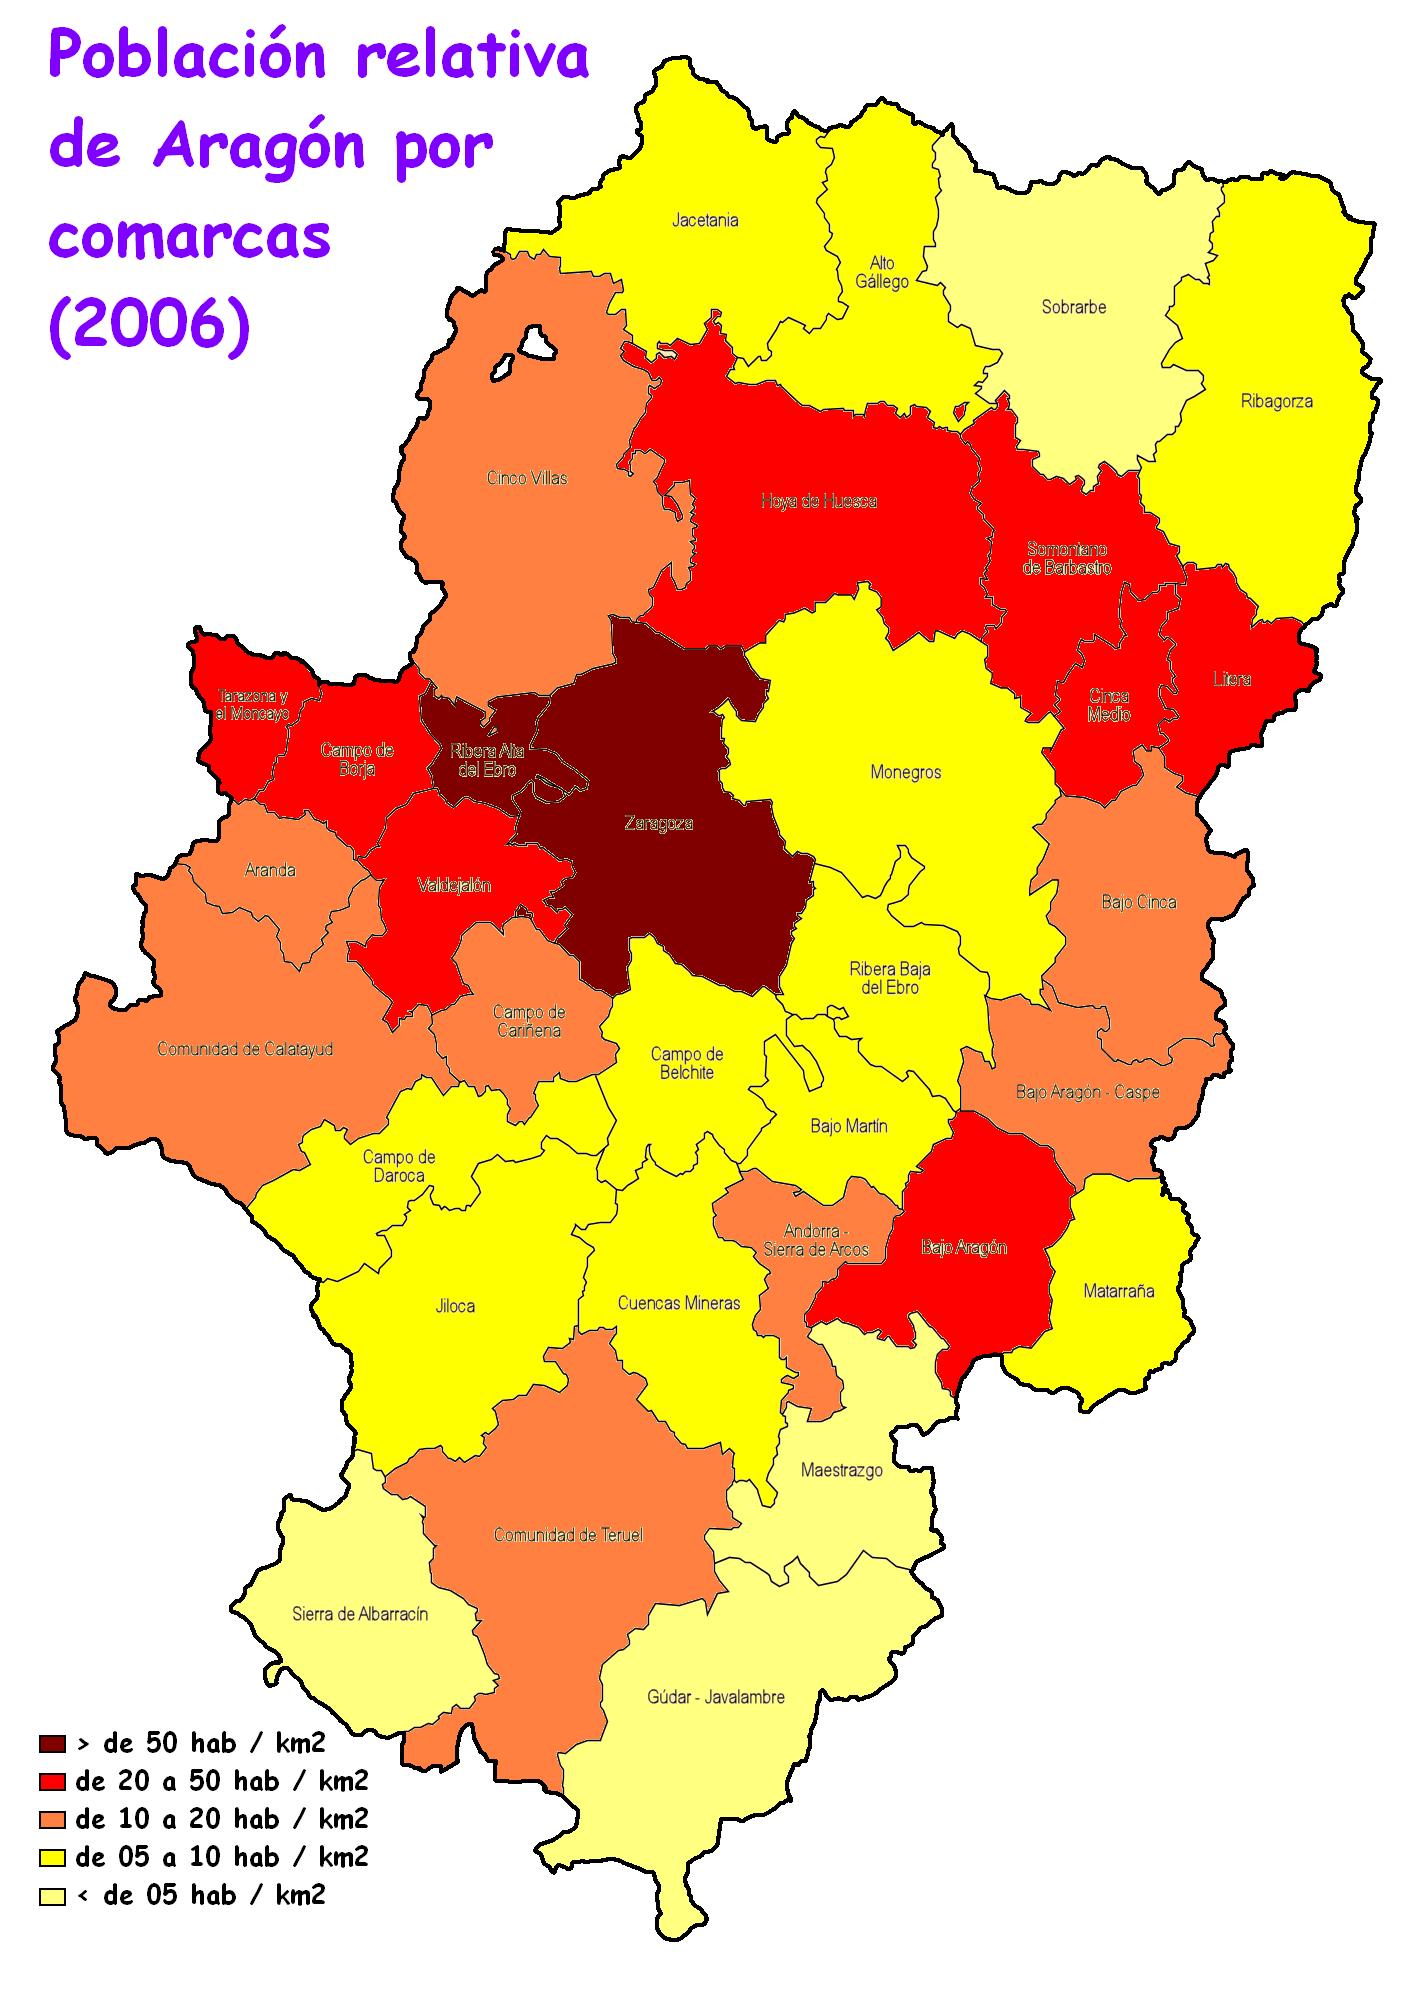 Aragon population 2006